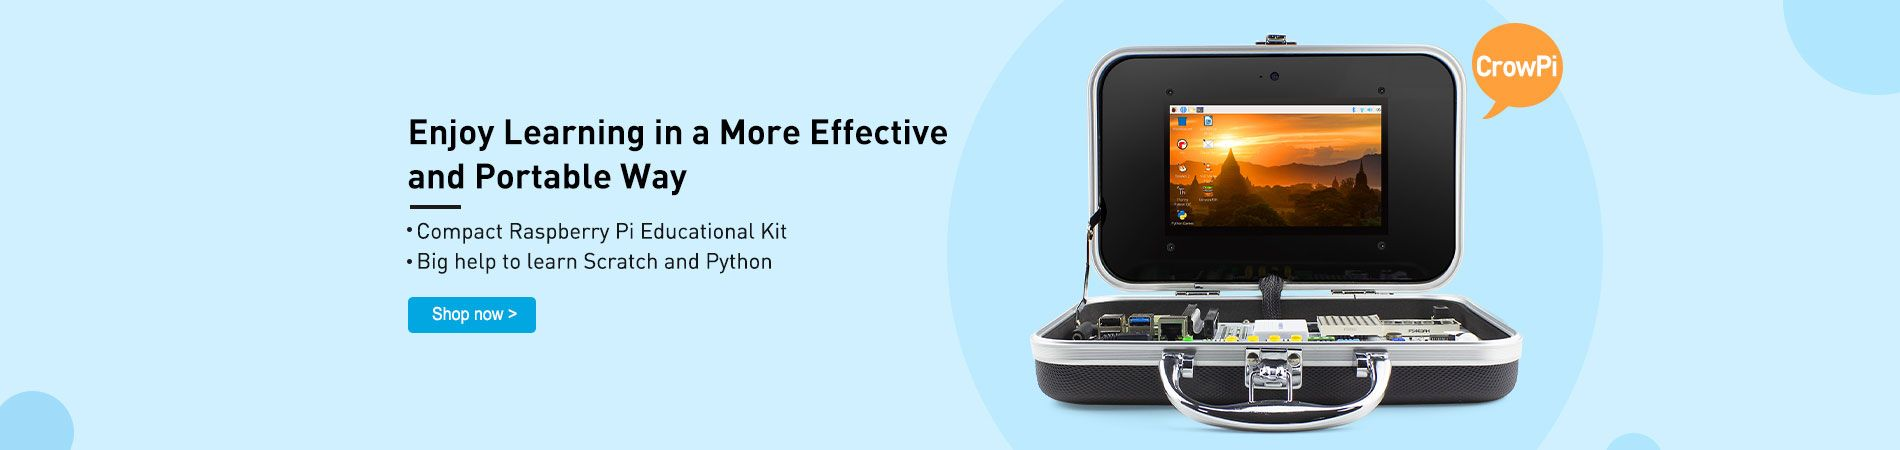 https://www.elecrow.com/crowpi-compact-raspberry-pi-educational-kit.html